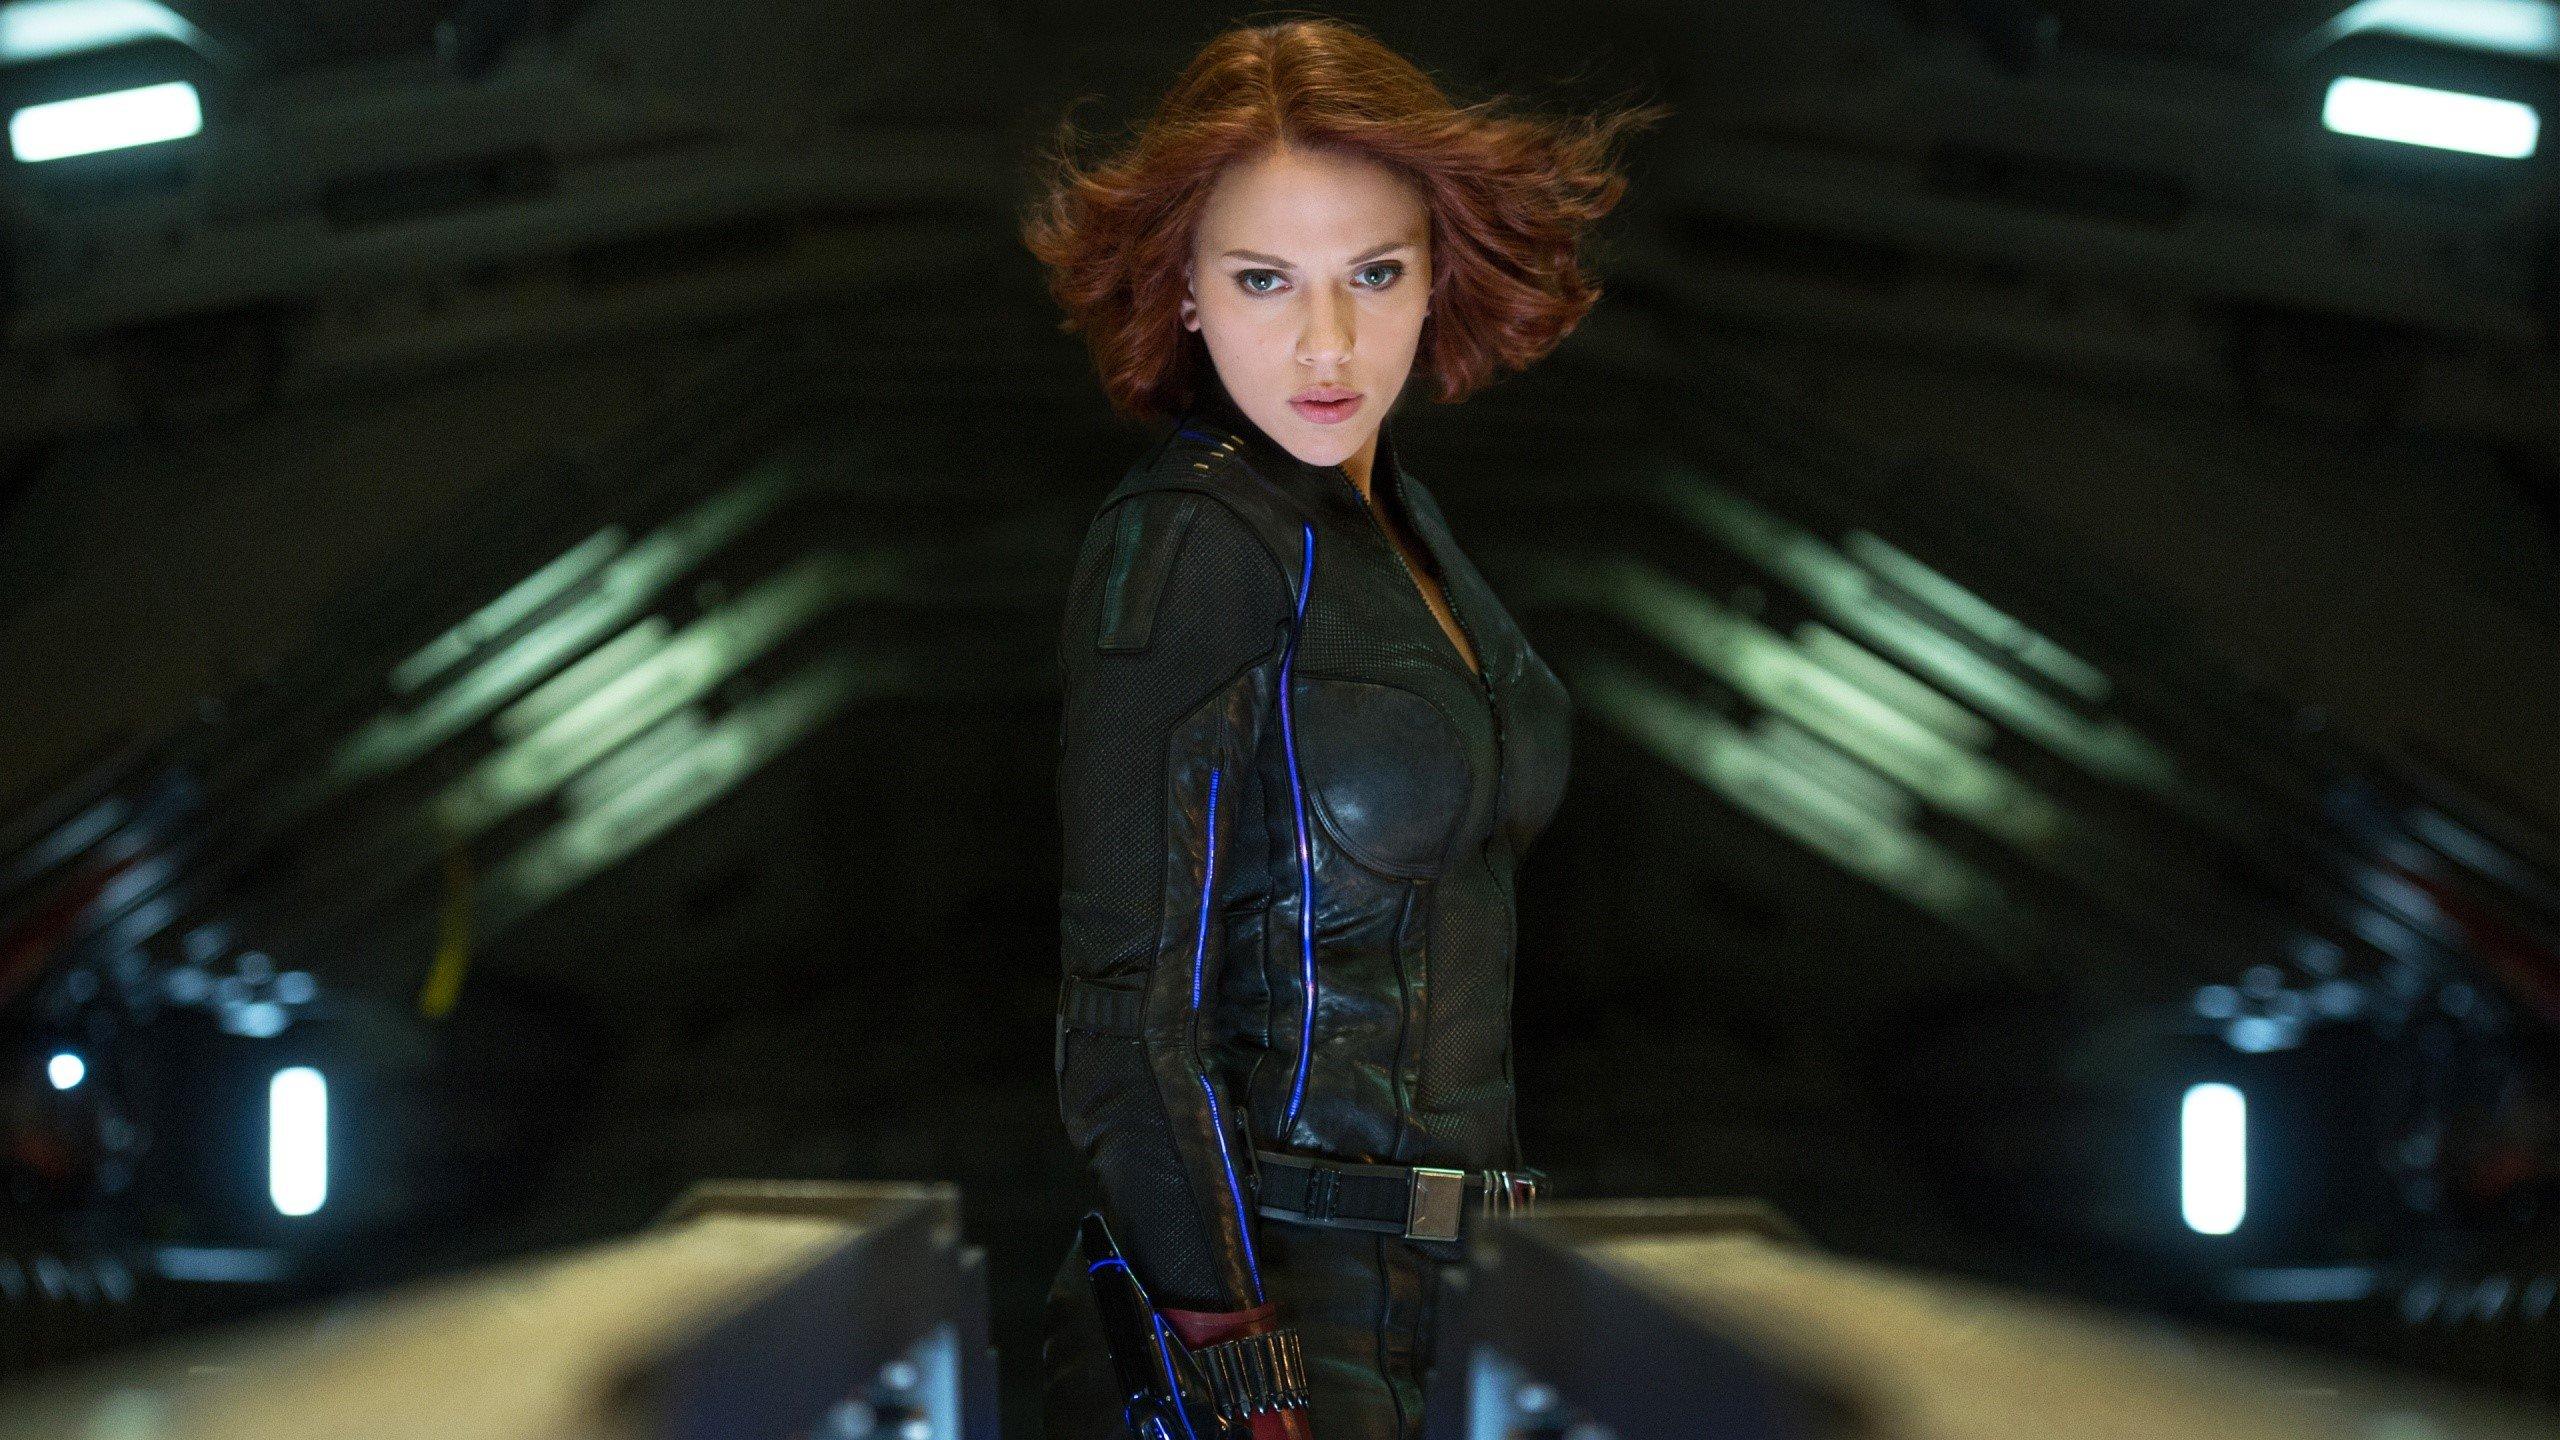 Scarlett Johansson as a Black Widow Wallpaper 2k Quad HD ID:1685